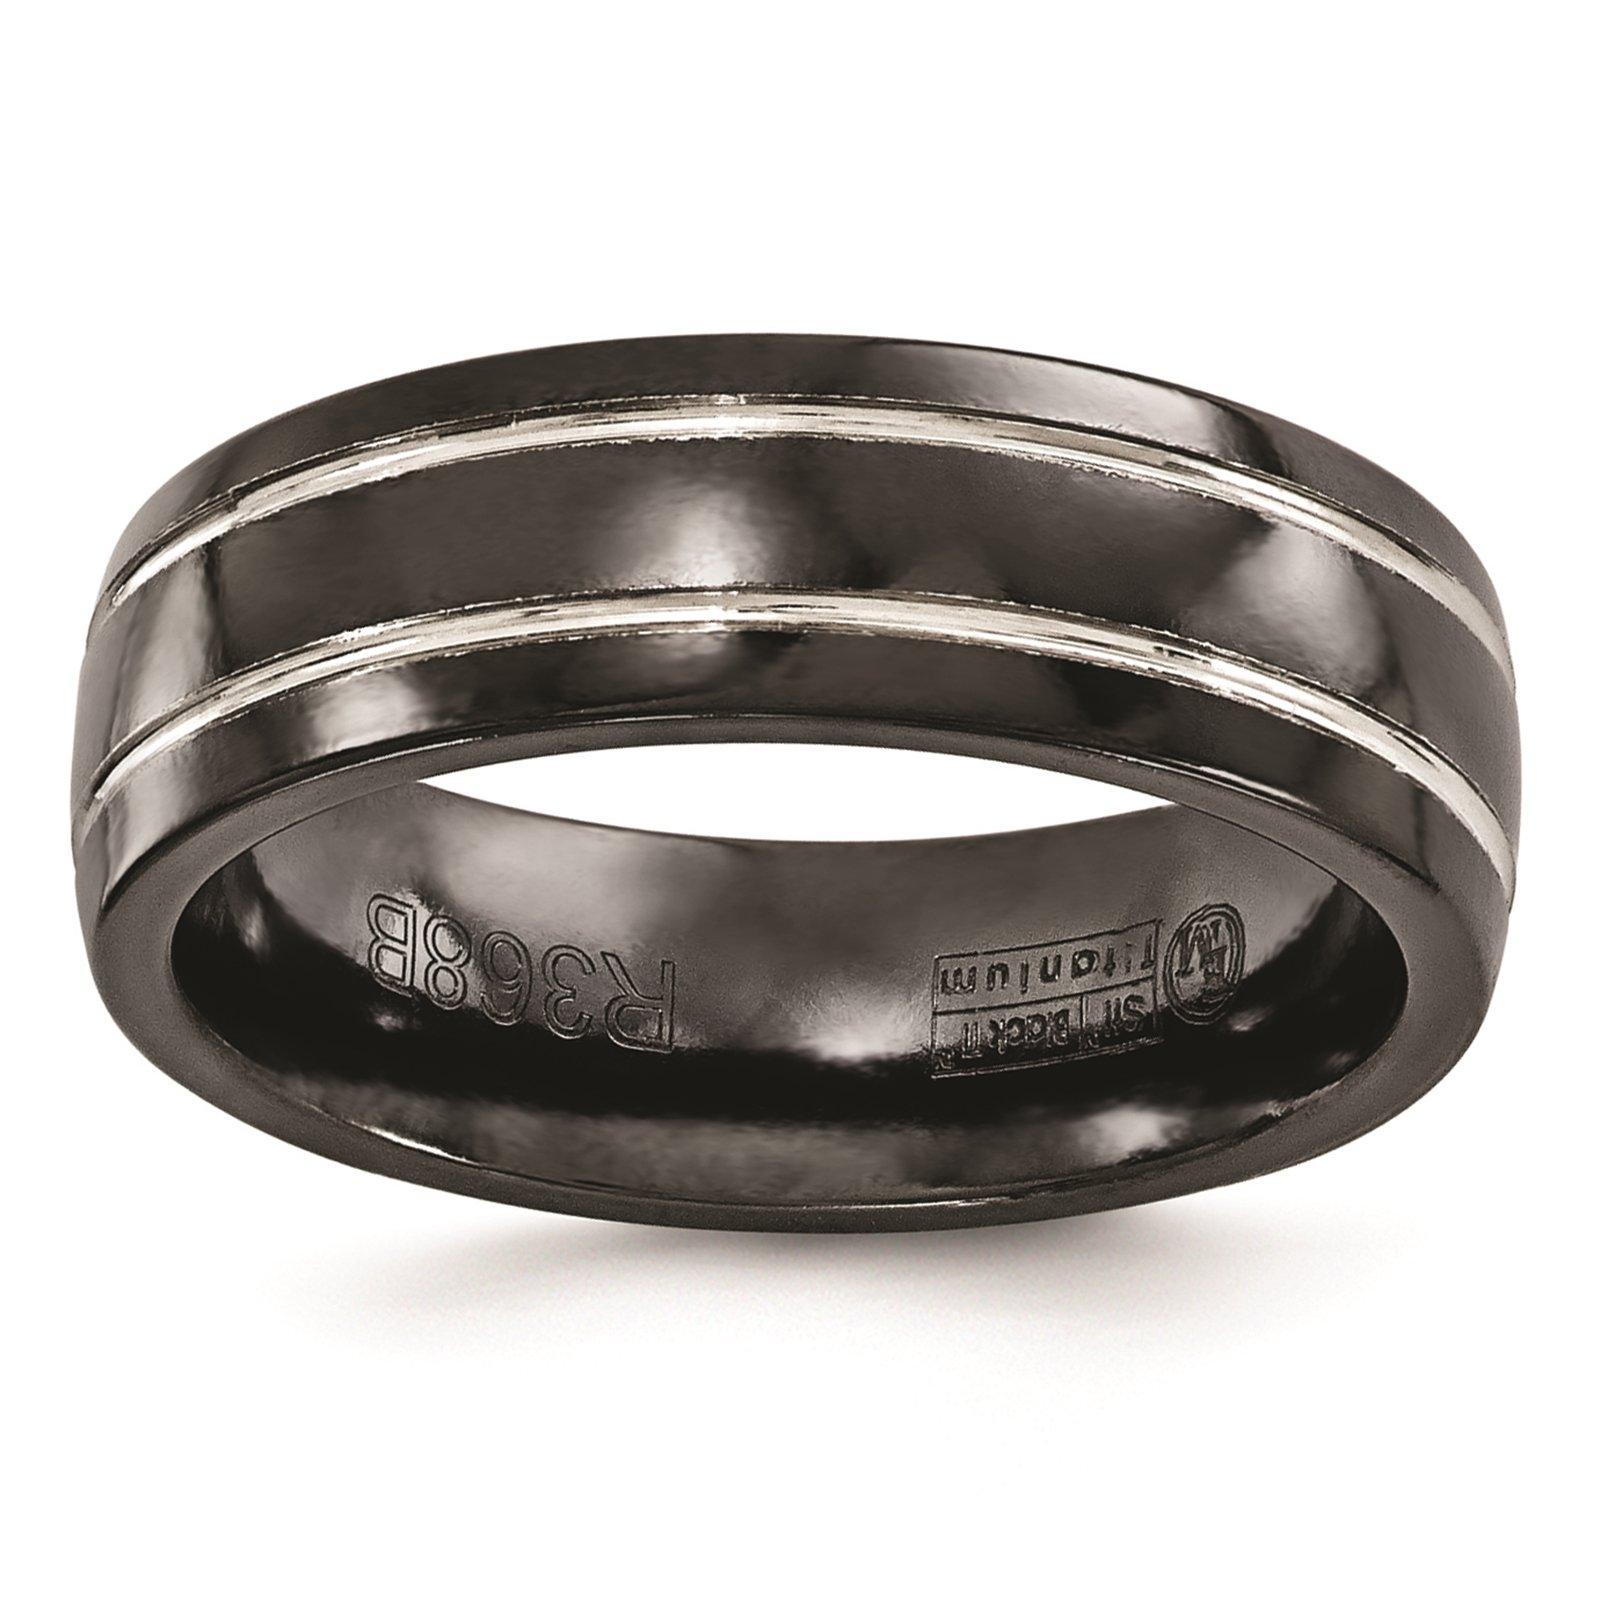 Titanium Black Ti & Grey Grooved 7mm Wedding Ring Band Size 8.5 by Edward Mirell by Venture Edward Mirell Titanium Bands (Image #1)